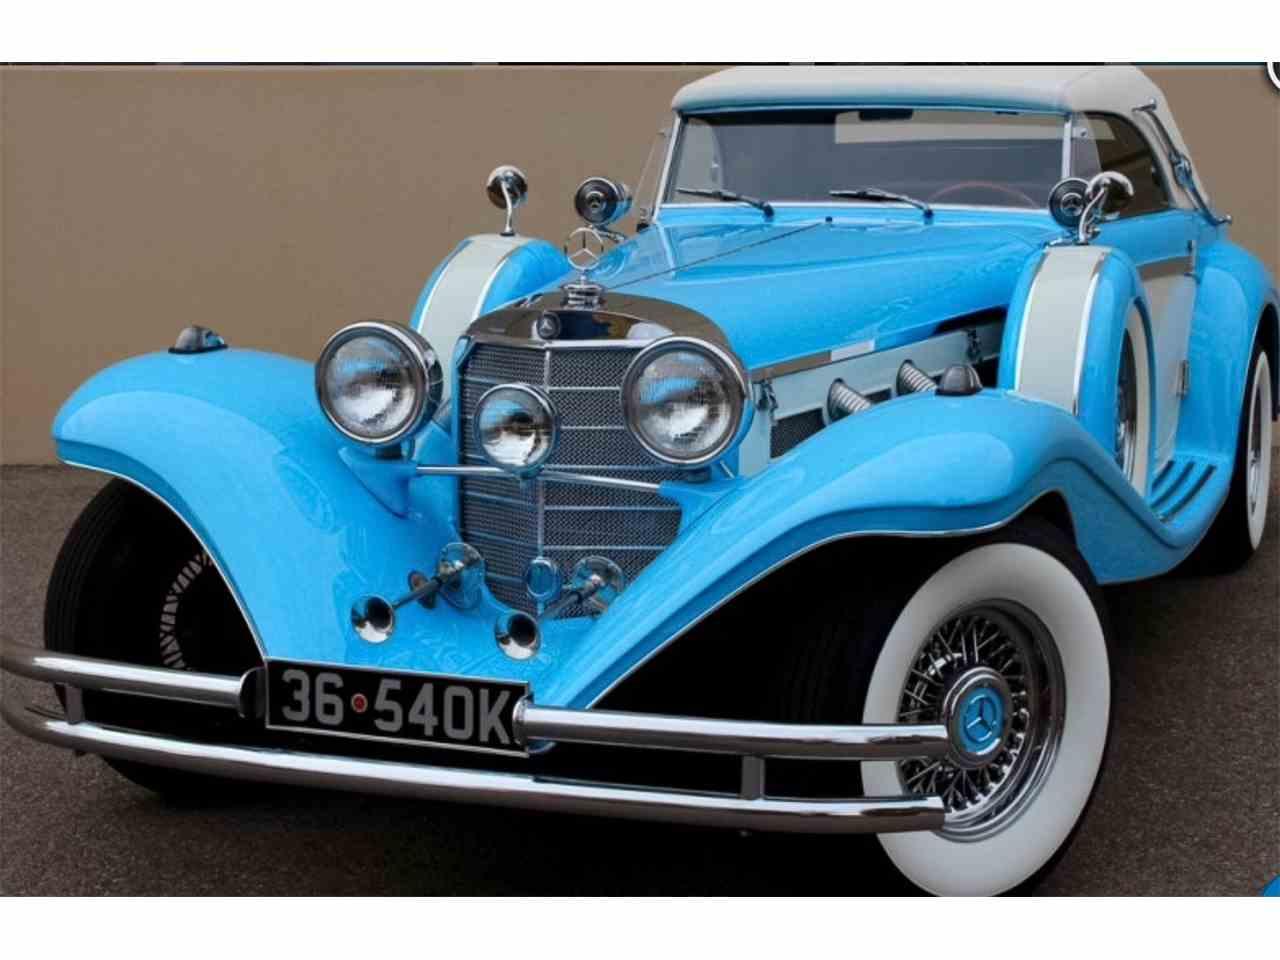 1936 mercedes benz 540k for sale cc for Mercedes benz charlottesville